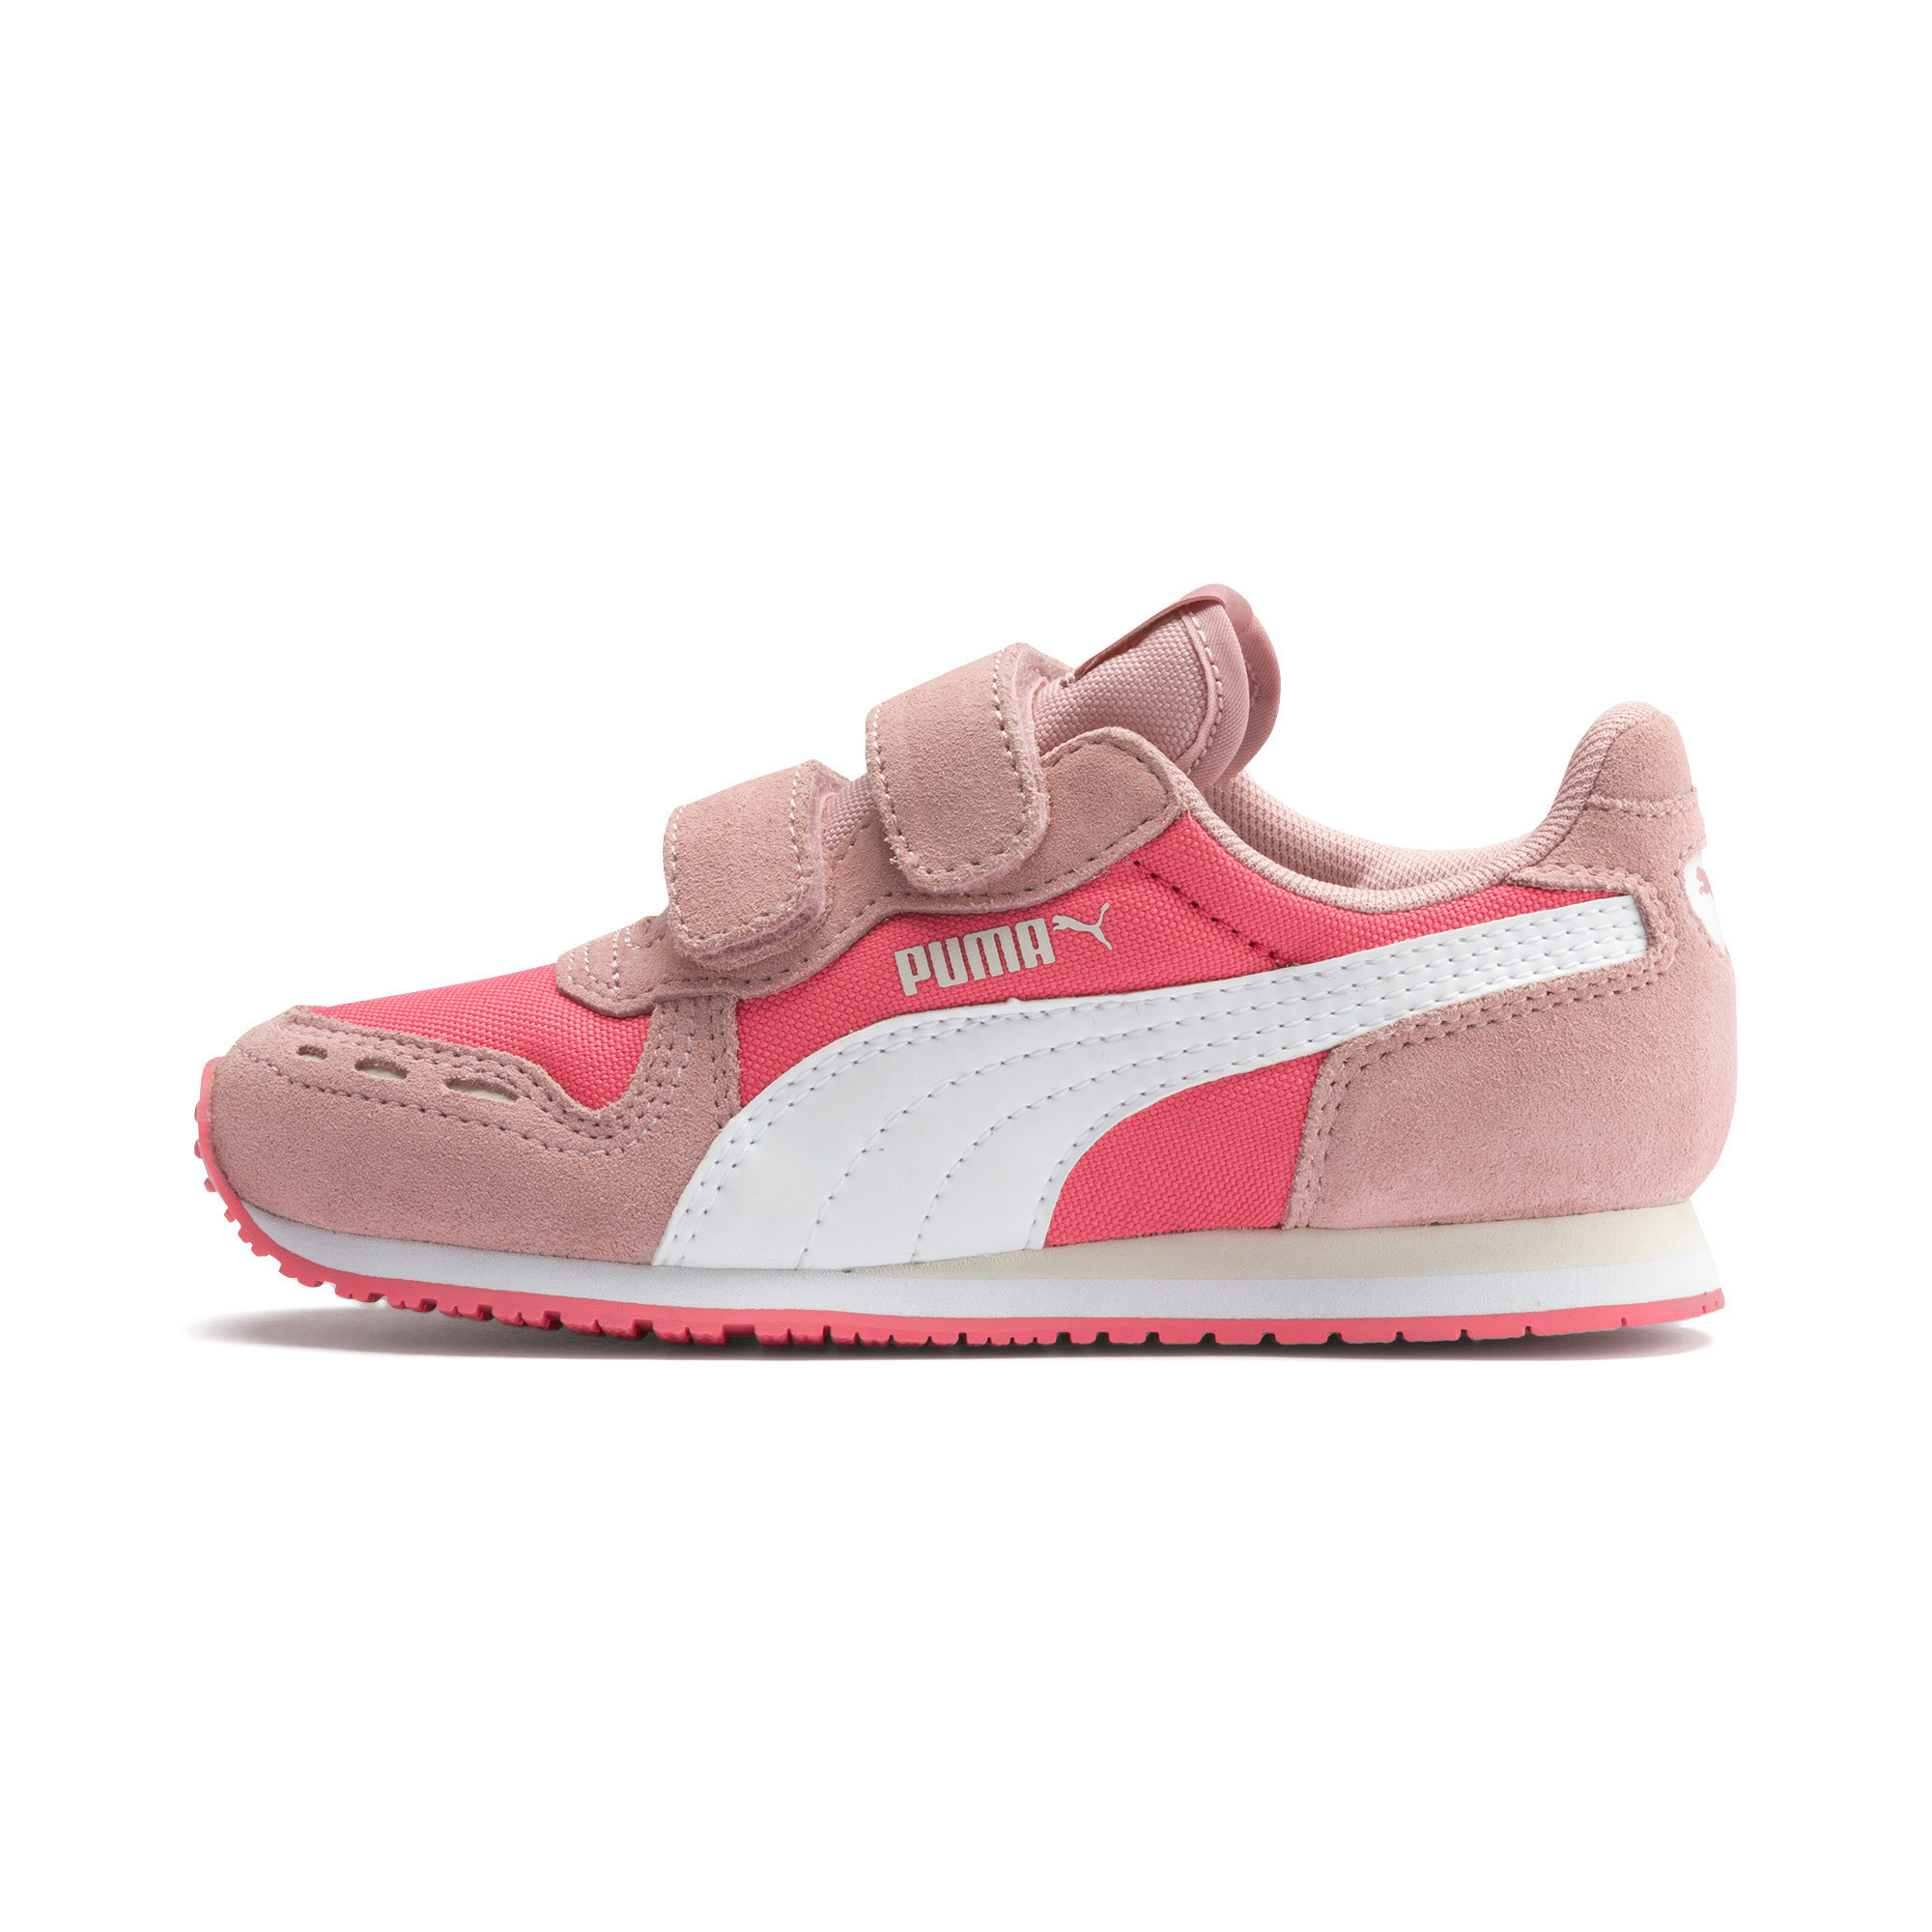 PUMA-Cabana-Racer-Little-Kids-039-Shoes-Kids-Shoe-Kids thumbnail 15